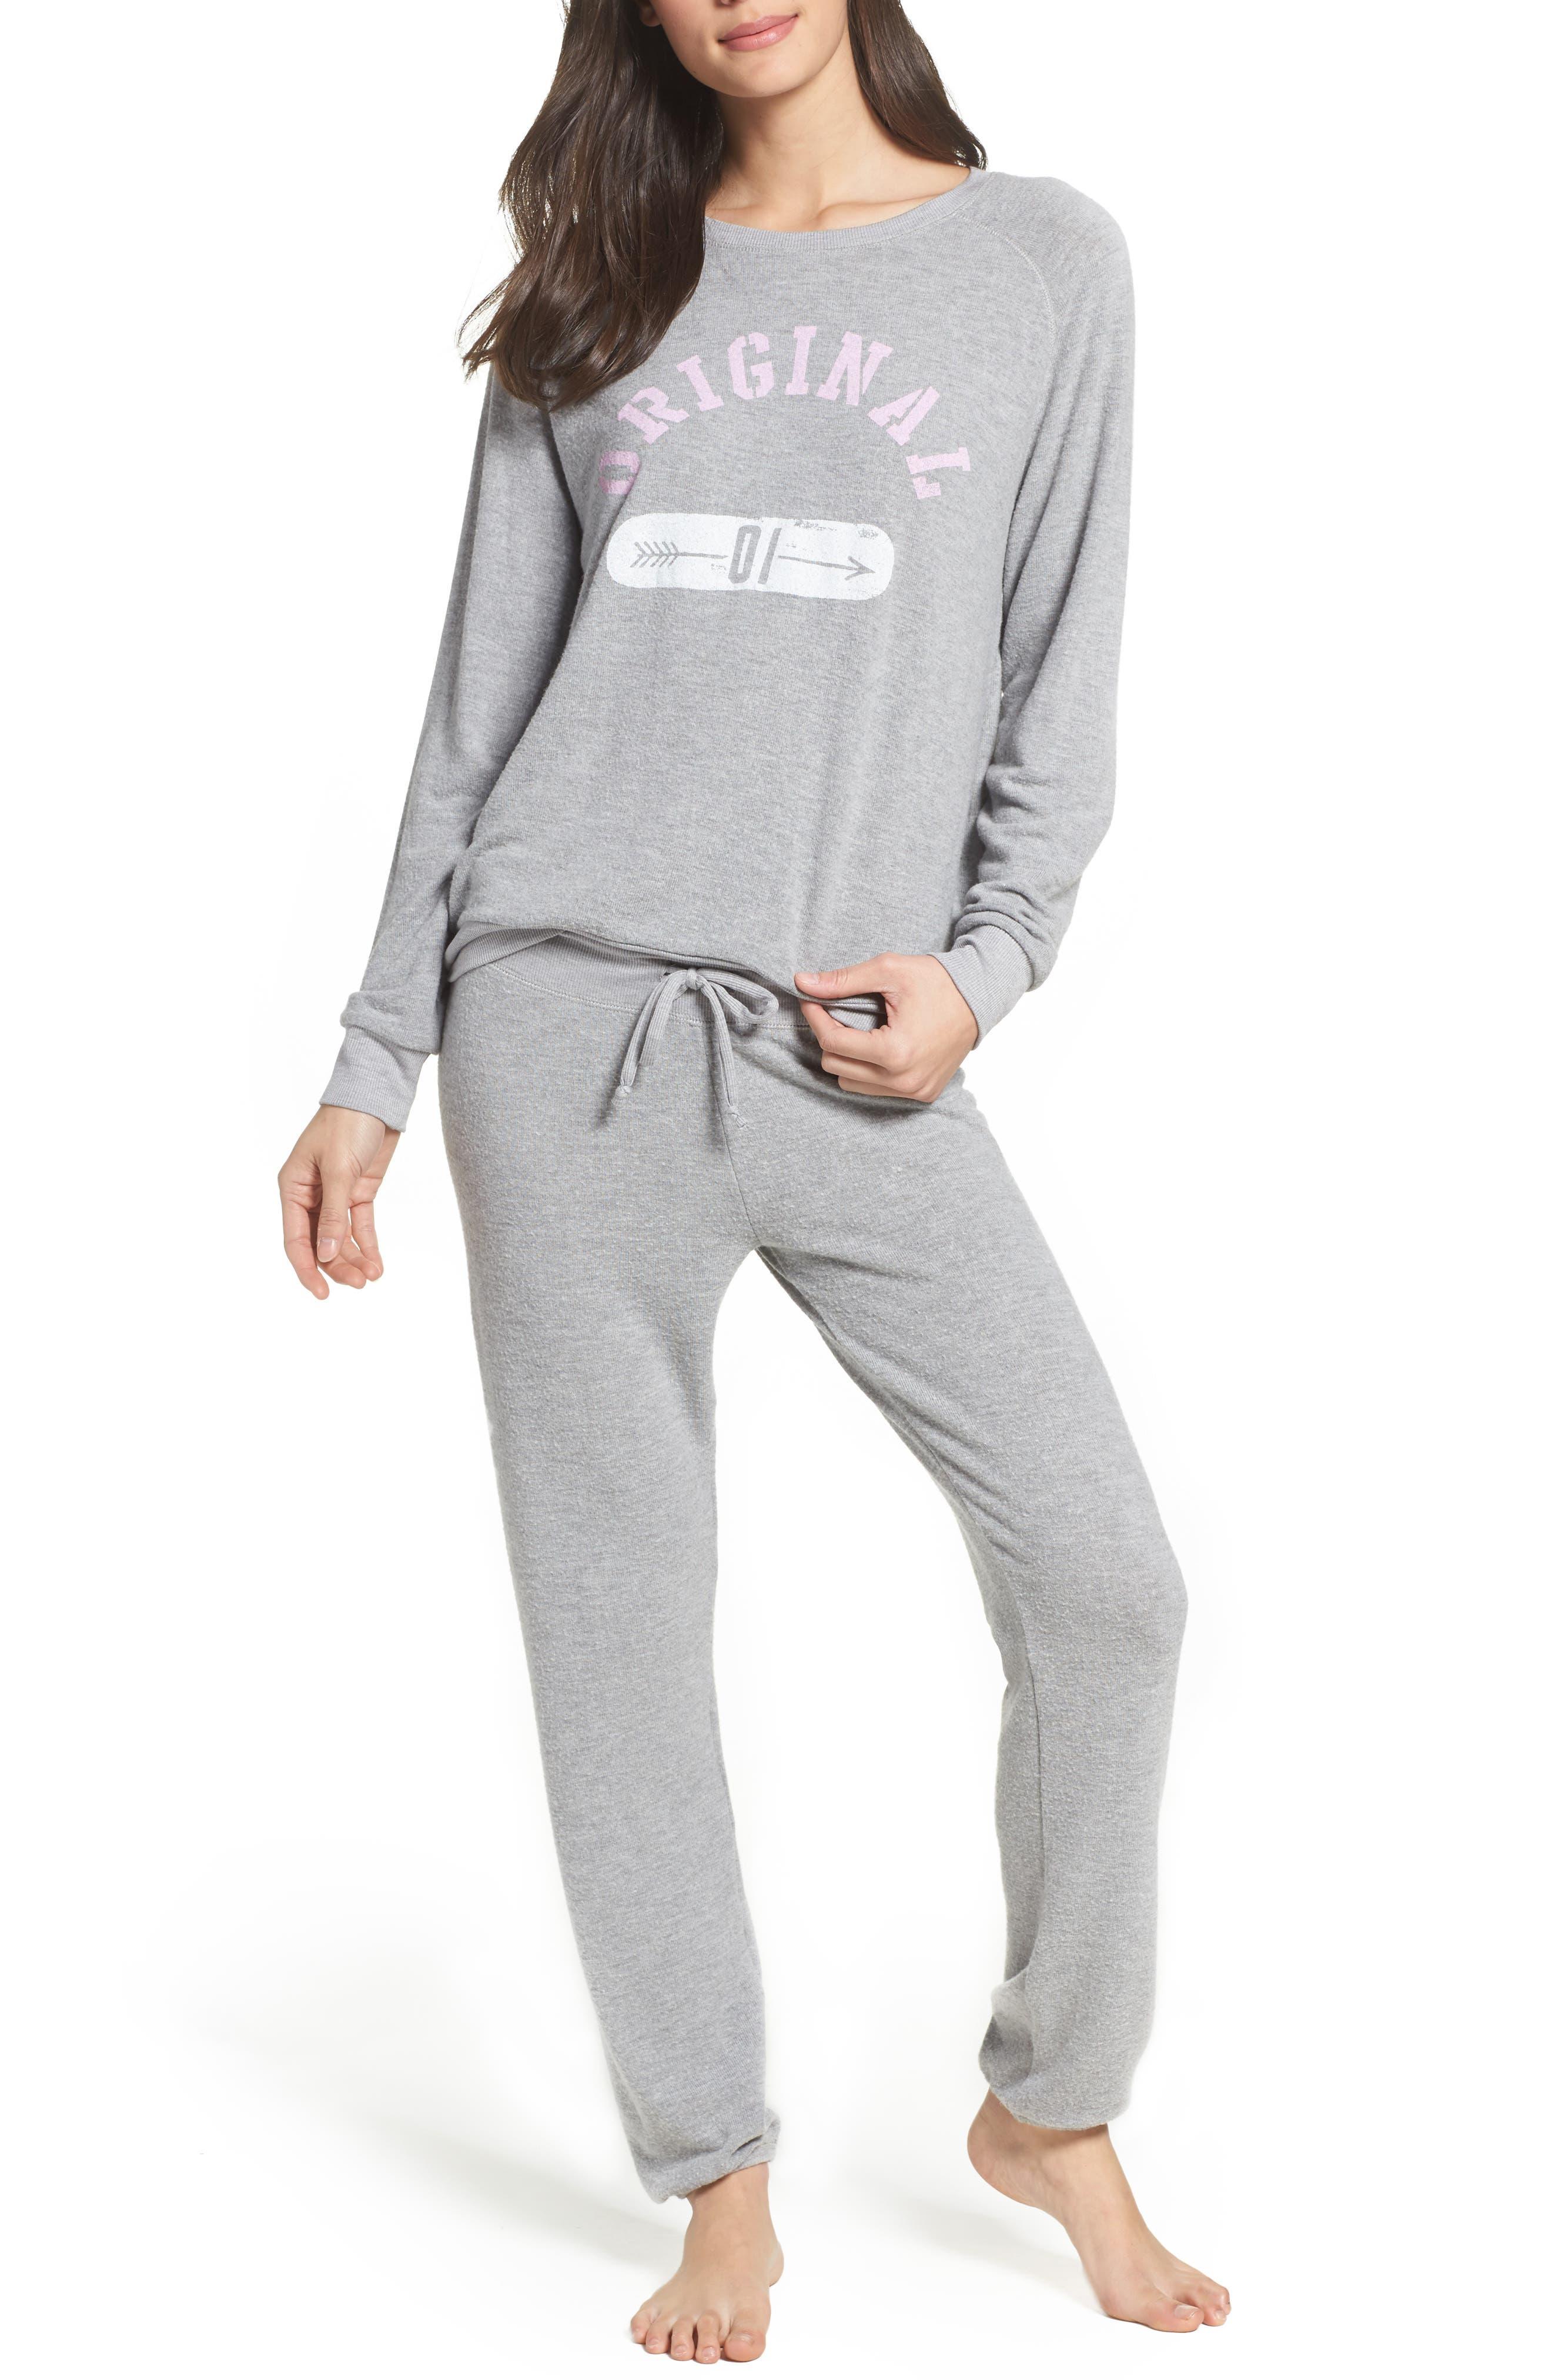 Junk Food Lounge Sweatshirt & Pants